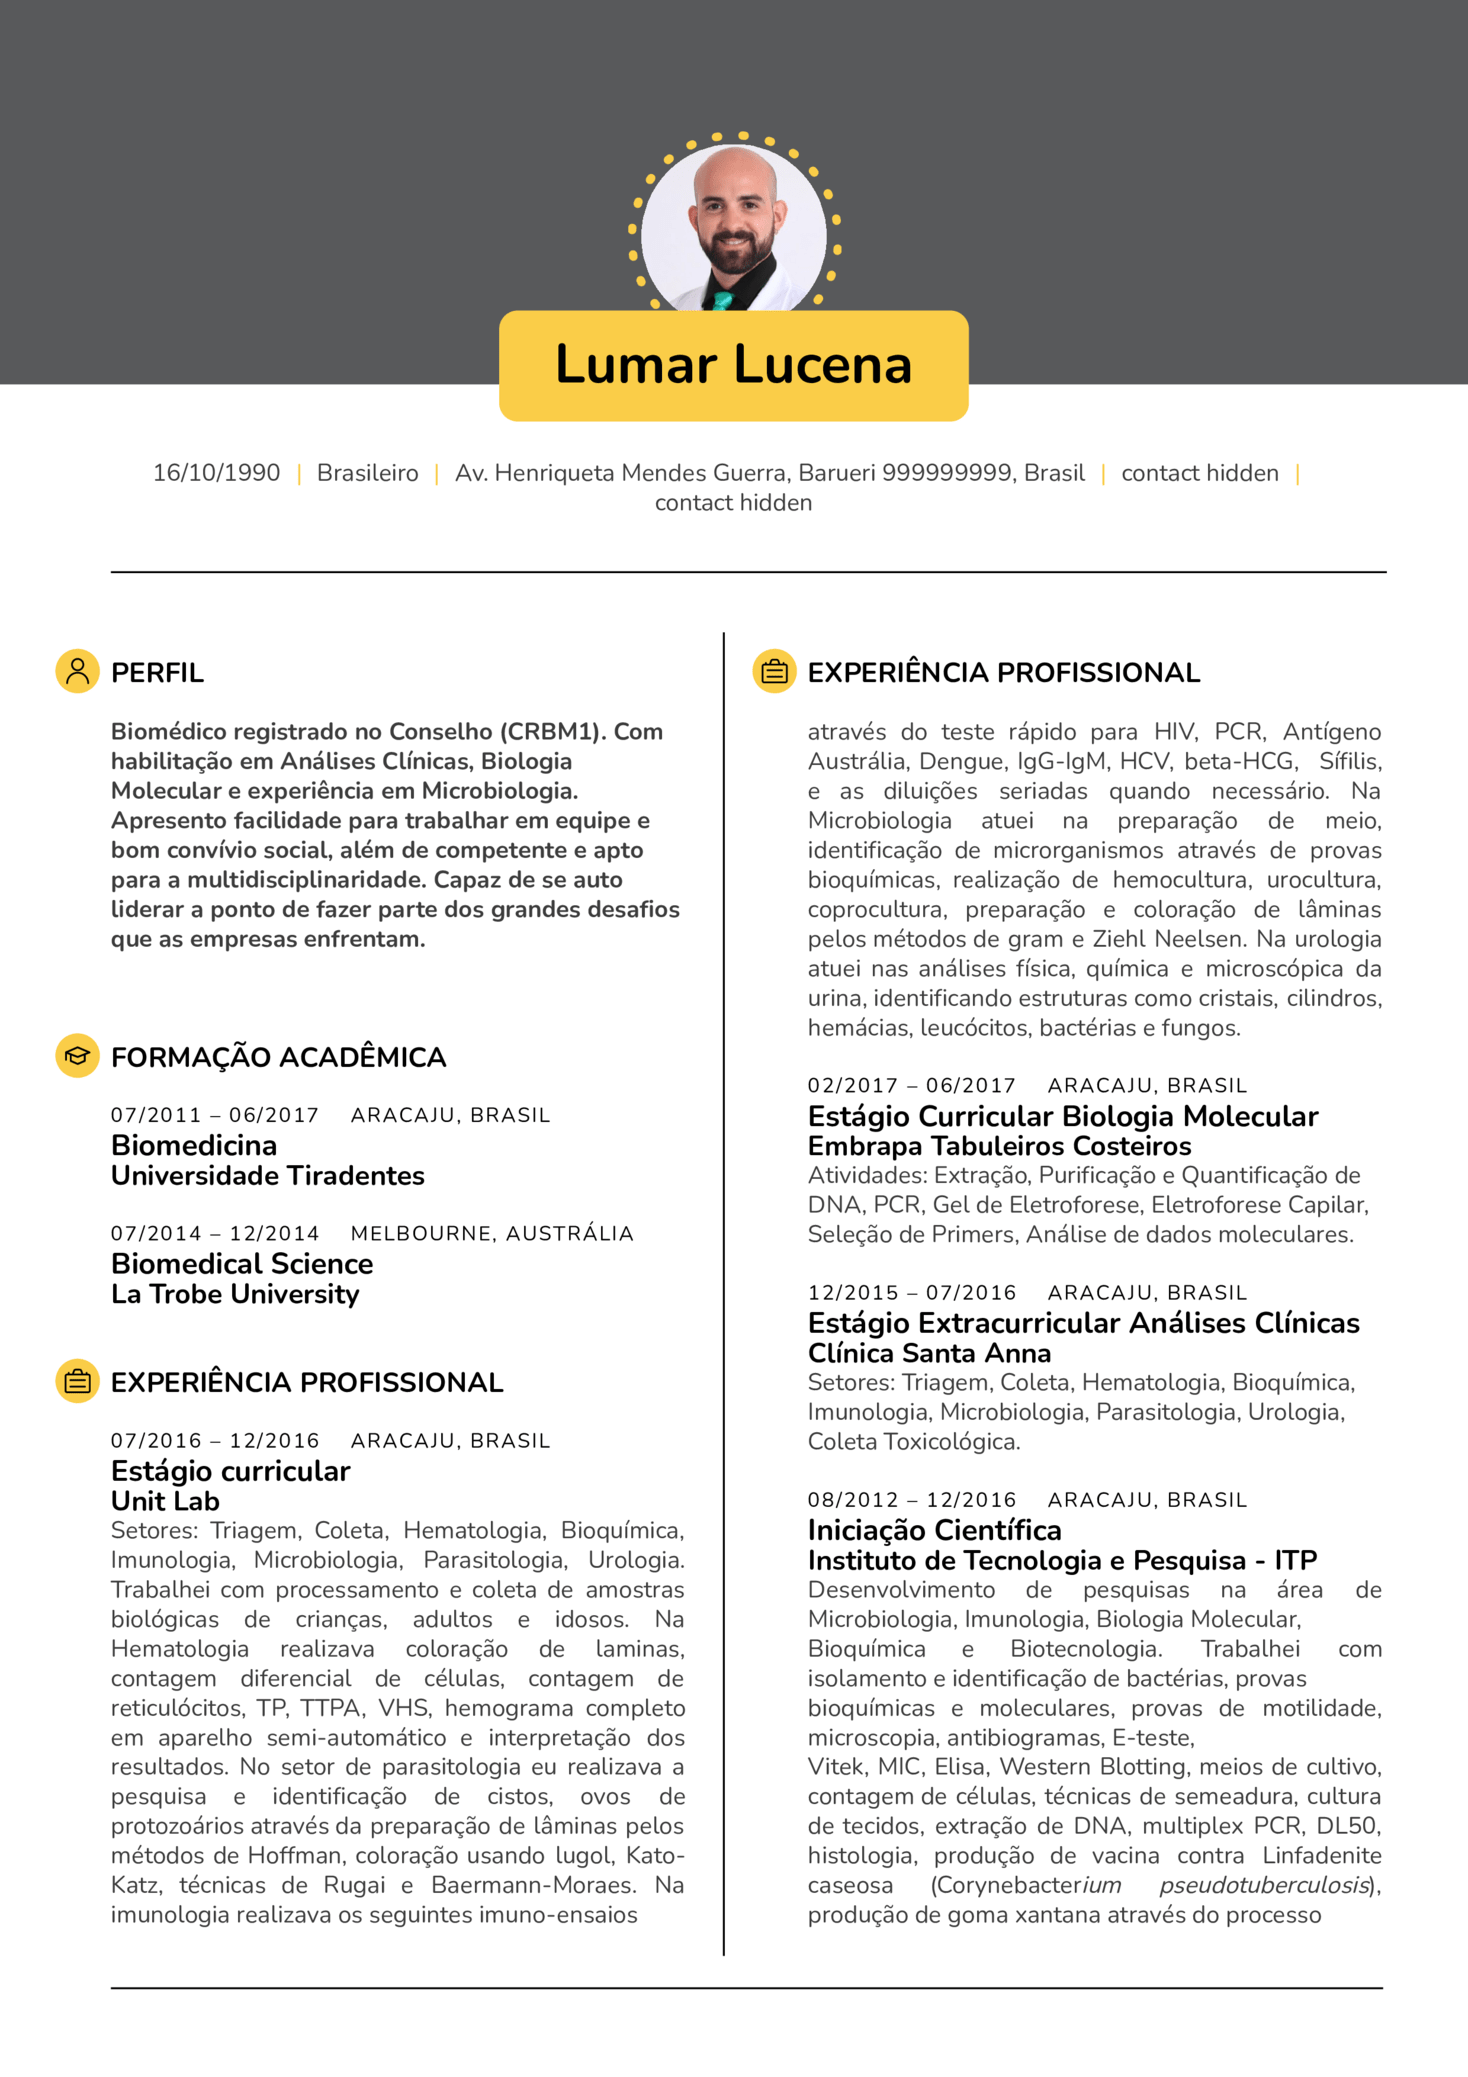 Analista de Laboratório Amostra de Resume (parte 1)